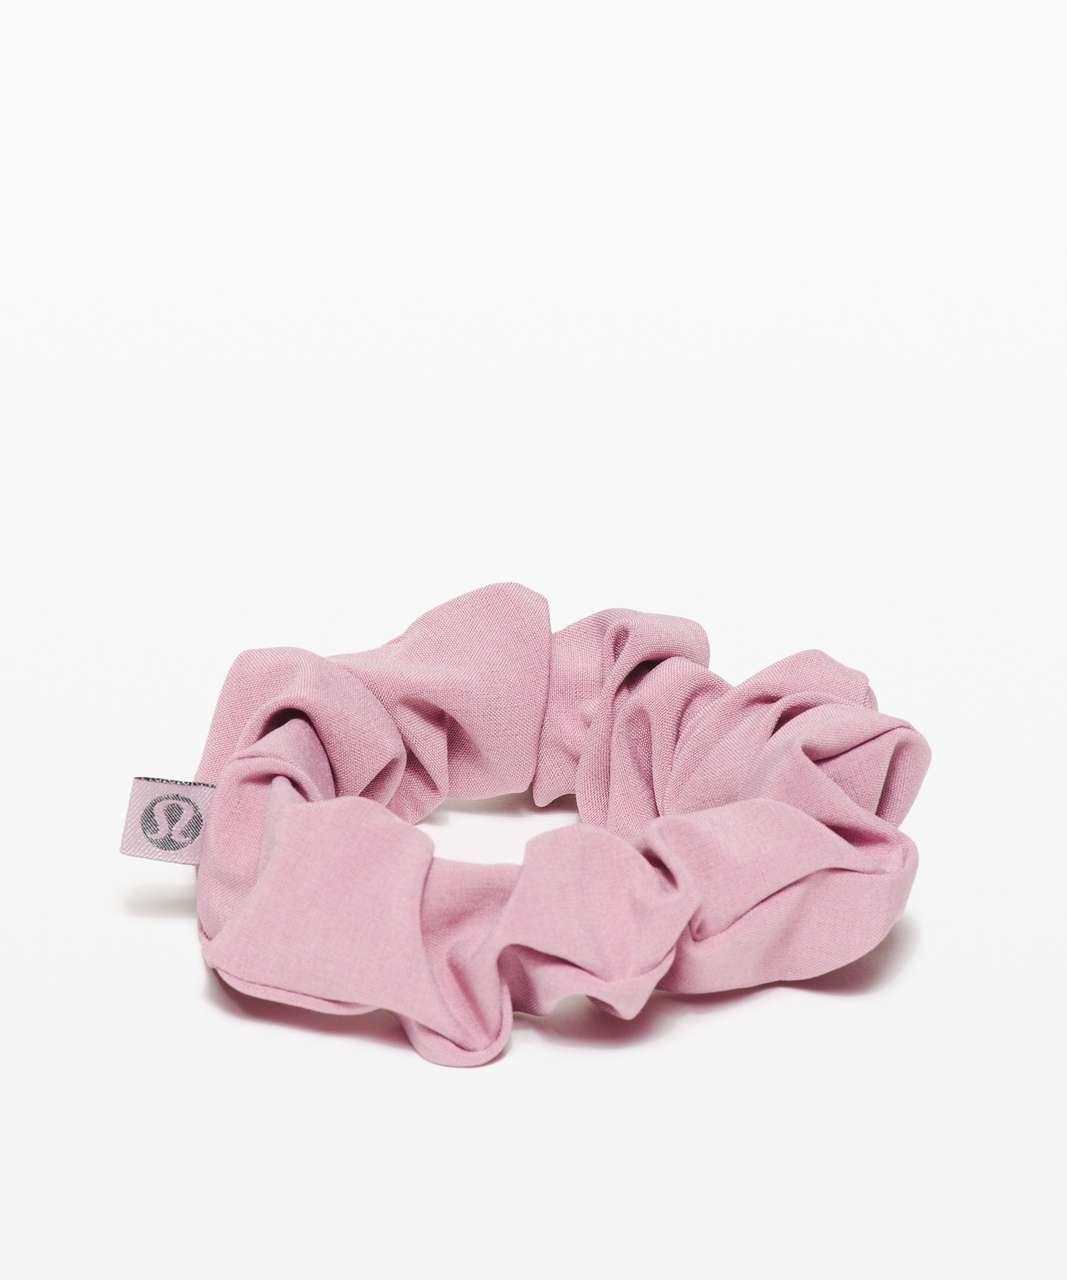 Lululemon Uplifting Scrunchie - Pink Taupe